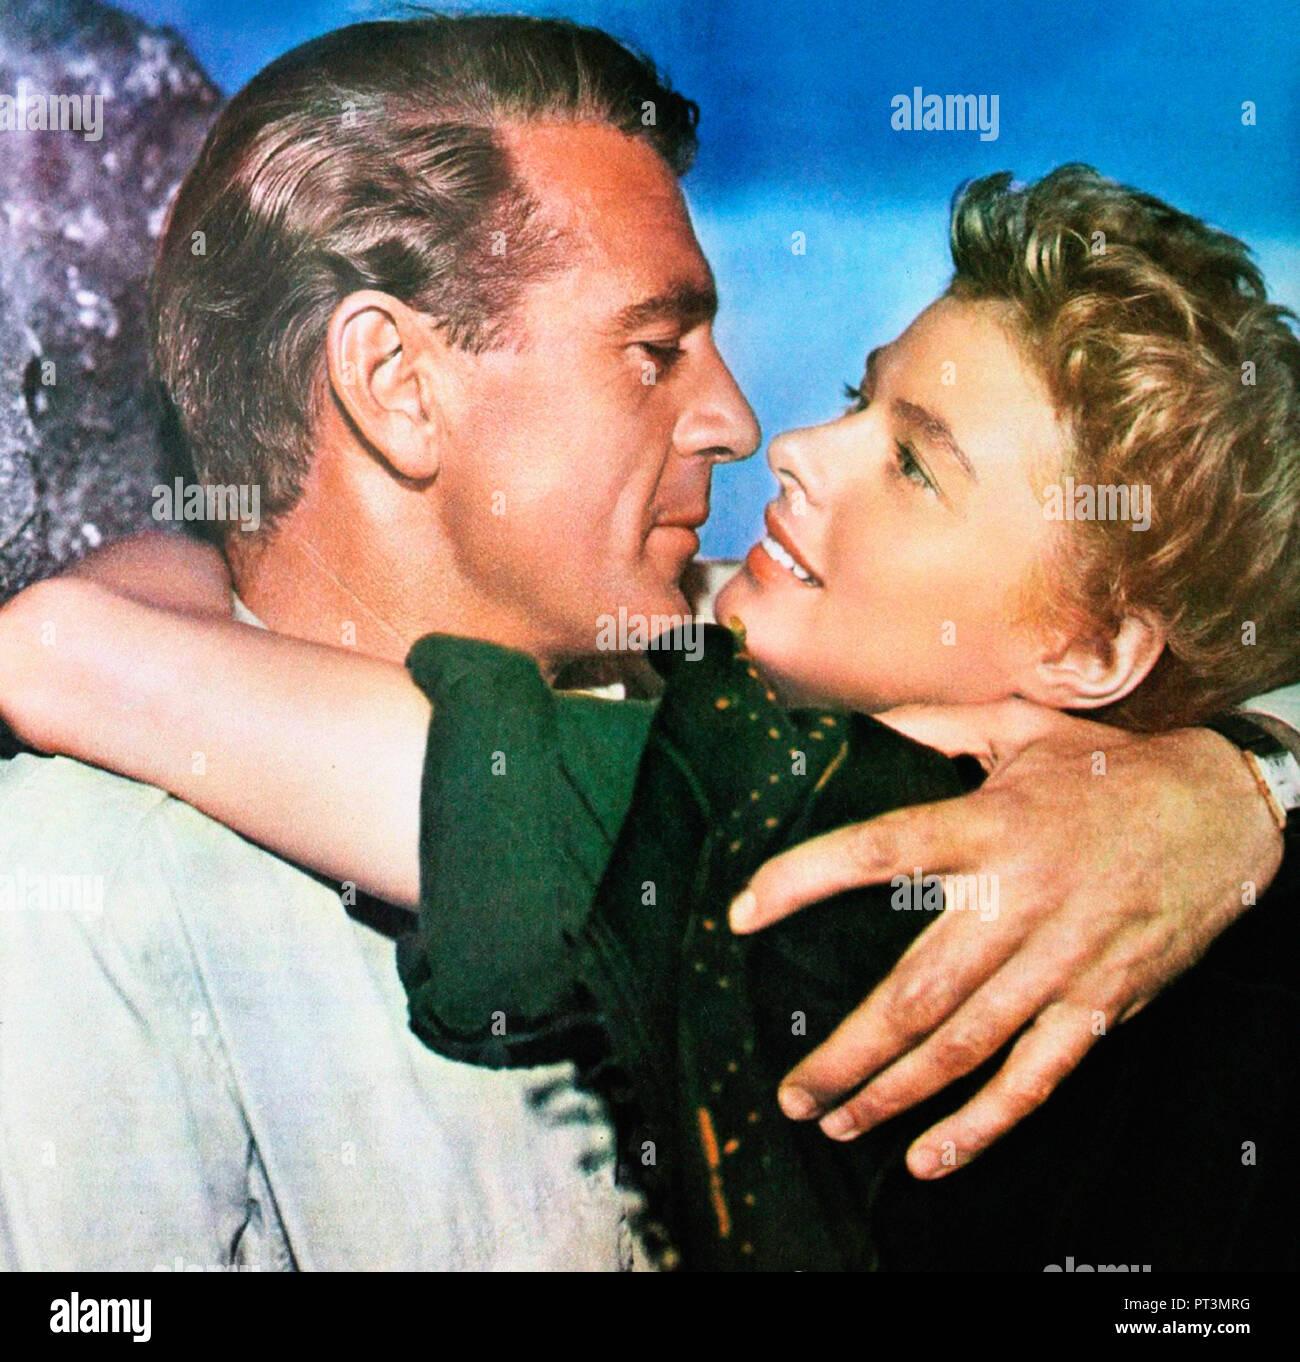 Prod DB © Paramount Pictures / DR POUR QUI SONNE LE GLAS FOR WHOM THE BELL TOLLS de Sam Wood 1942 USA Gary Cooper Ingrid Bergman. guerre d'Espagne; sp - Stock Image